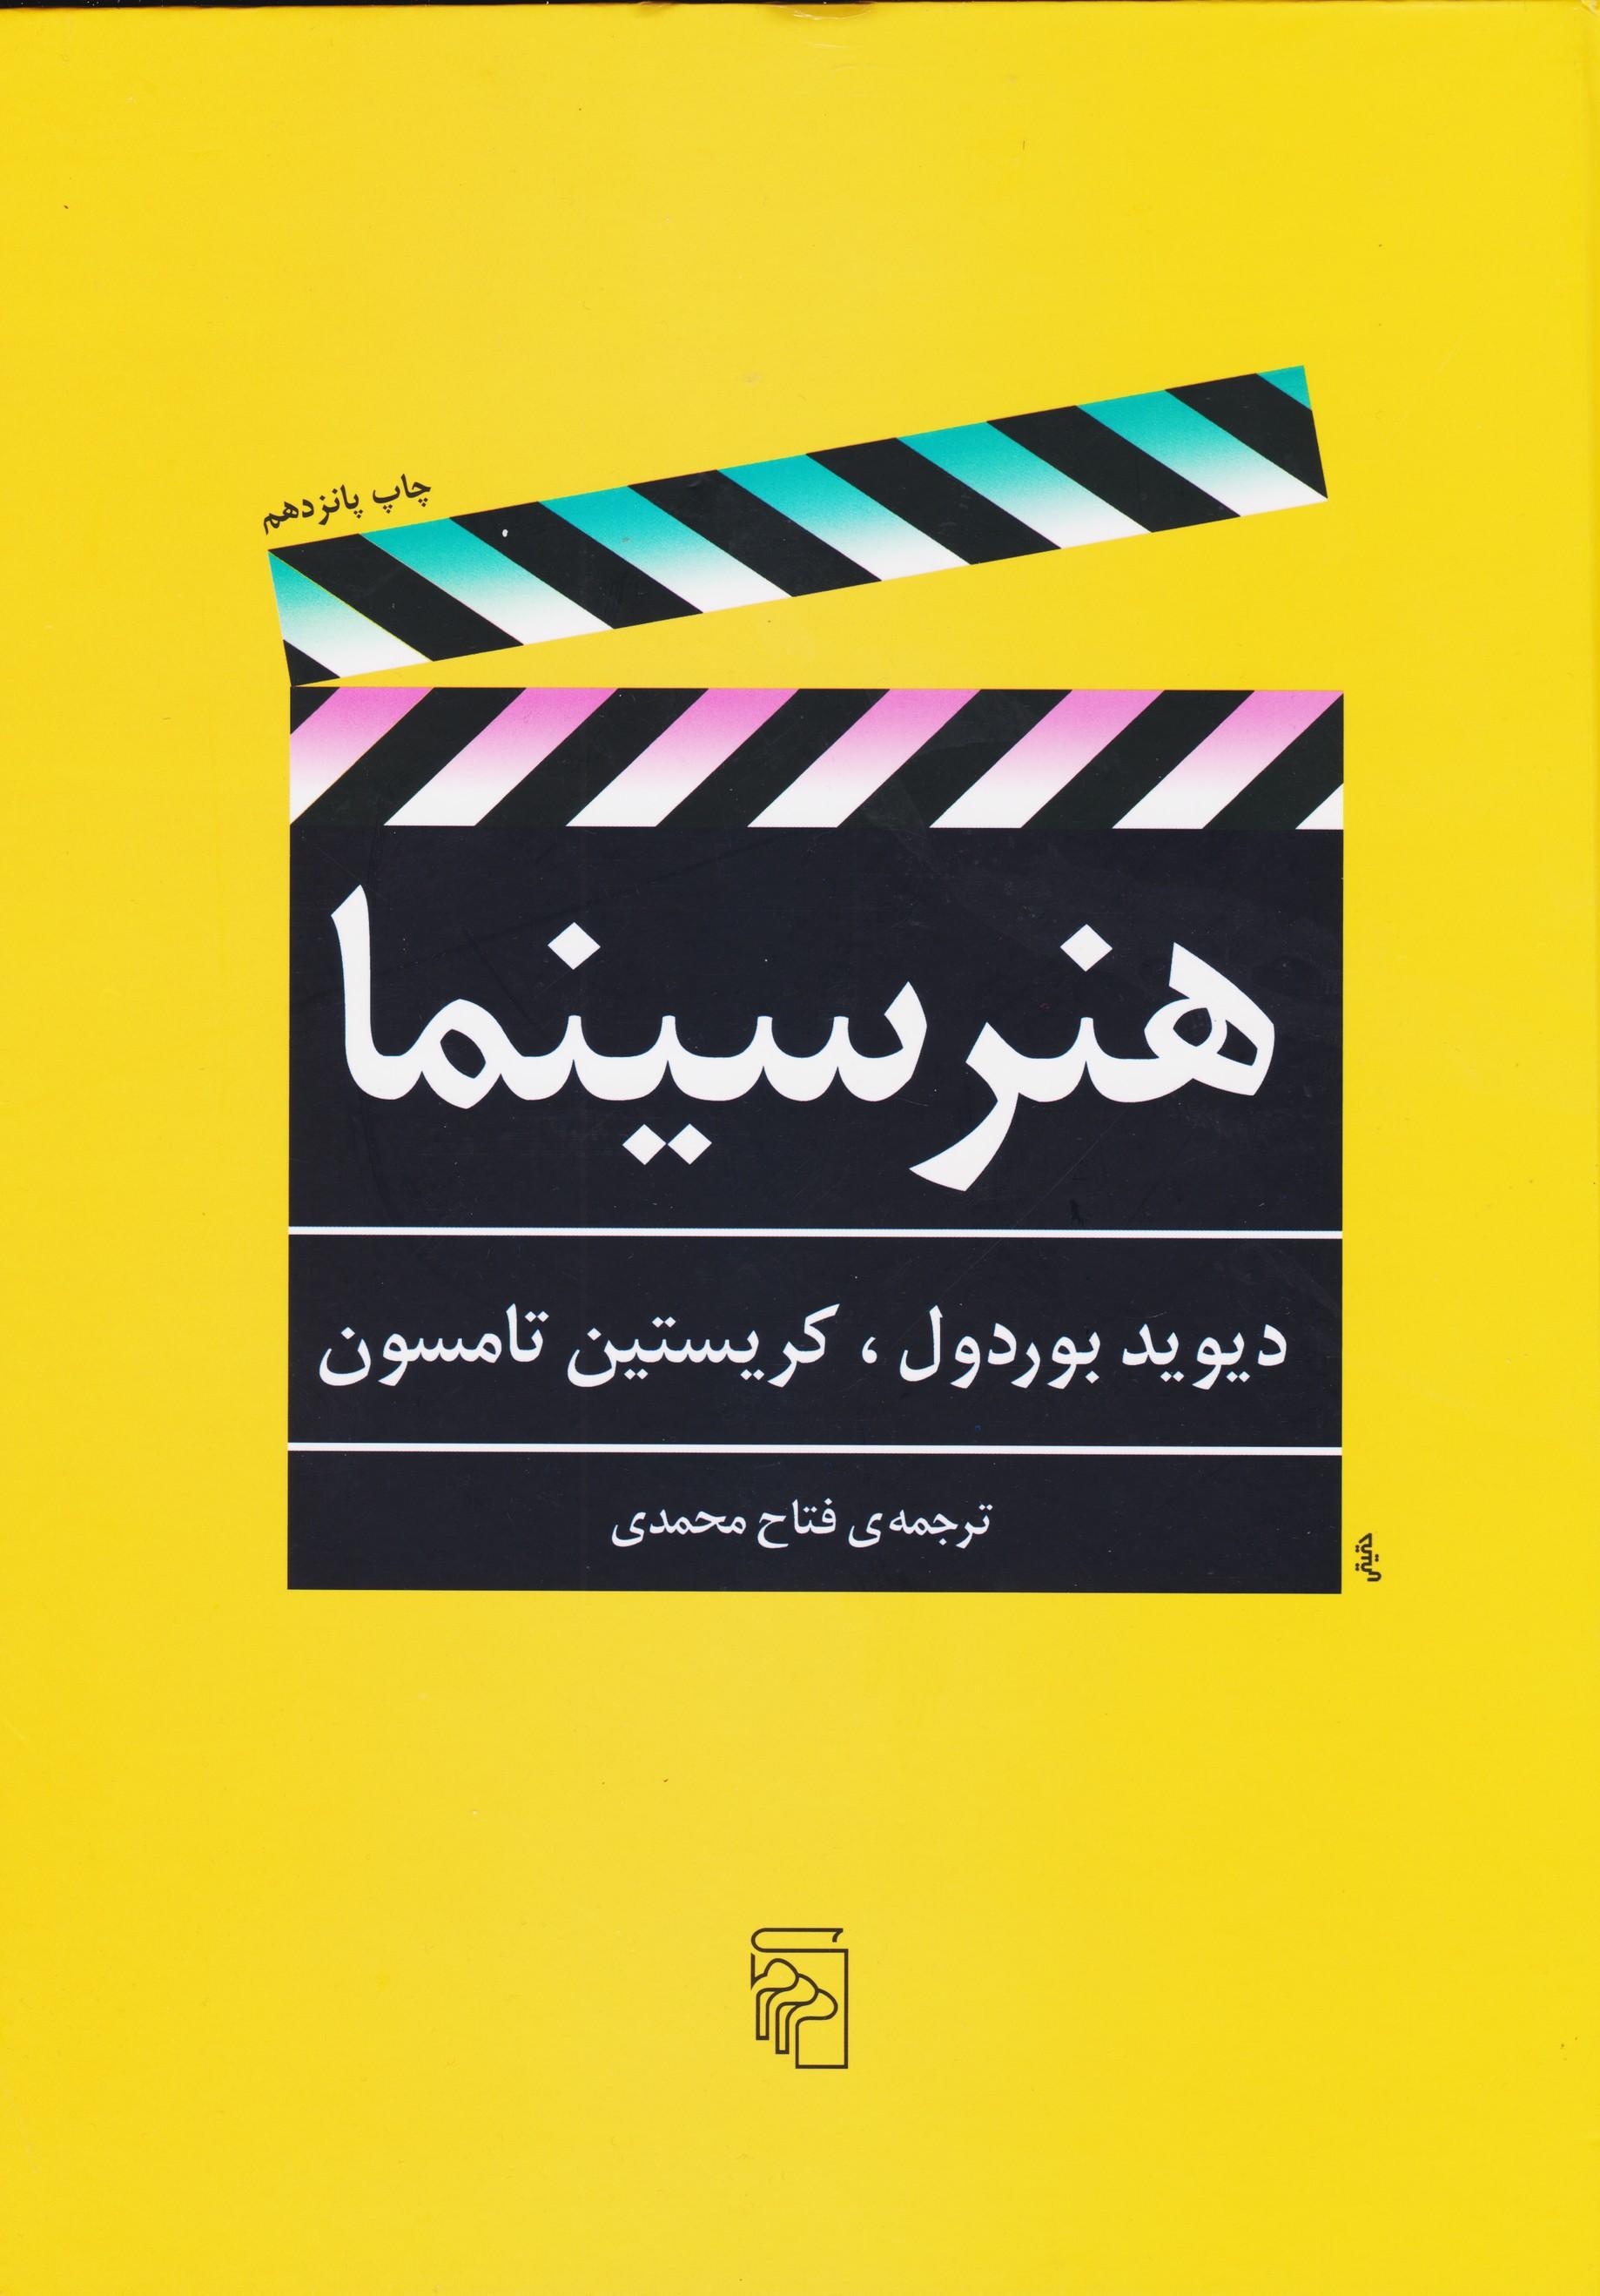 کتاب هنر سینما